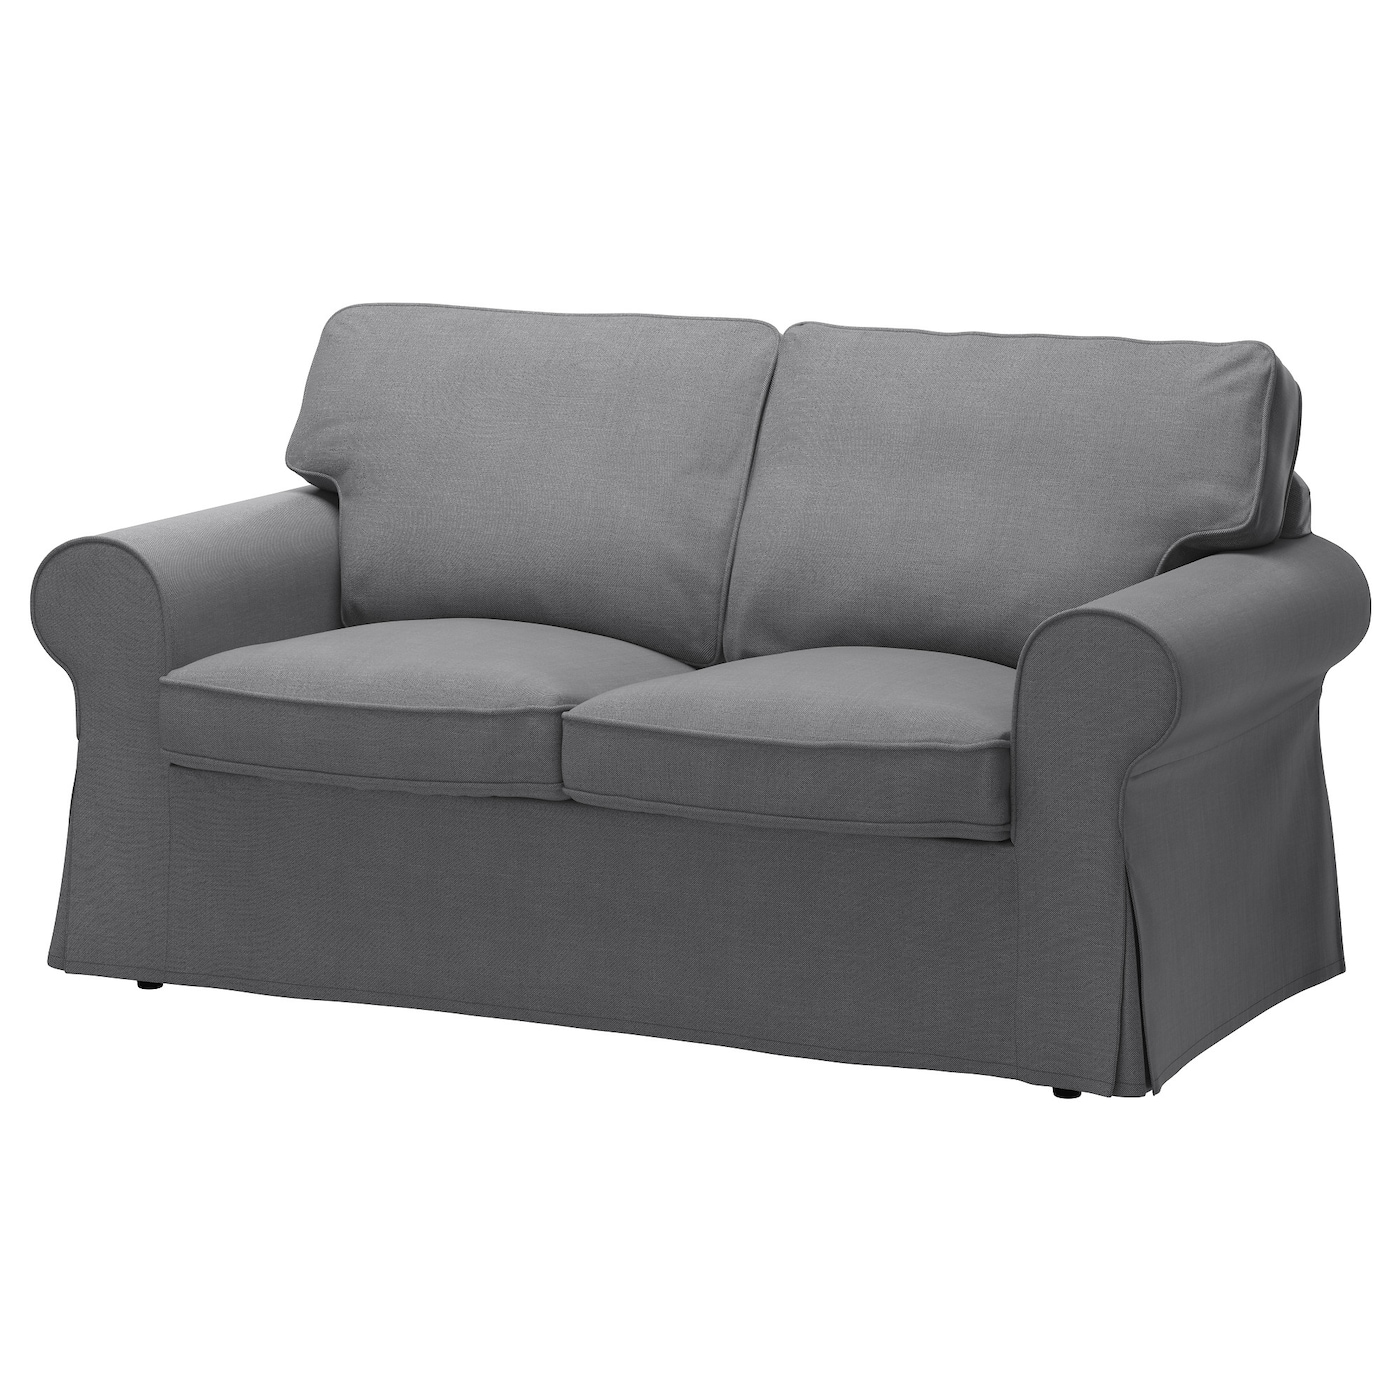 ektorp canap 2 places nordvalla gris fonc ikea. Black Bedroom Furniture Sets. Home Design Ideas